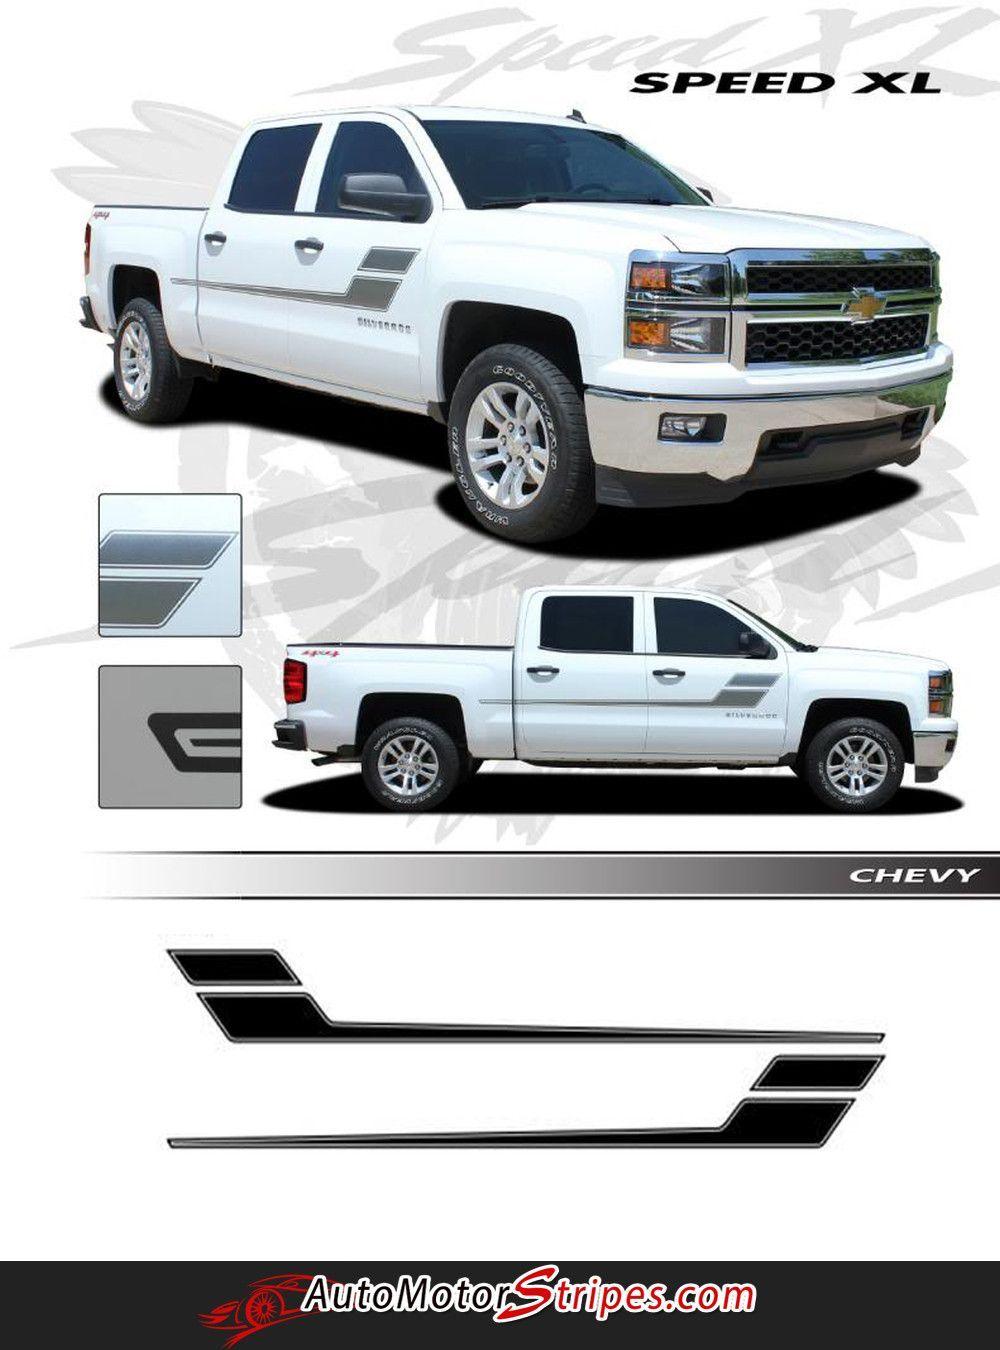 2007 2018 Chevy Silverado Speed Xl Truck Side Door Hockey Vinyl